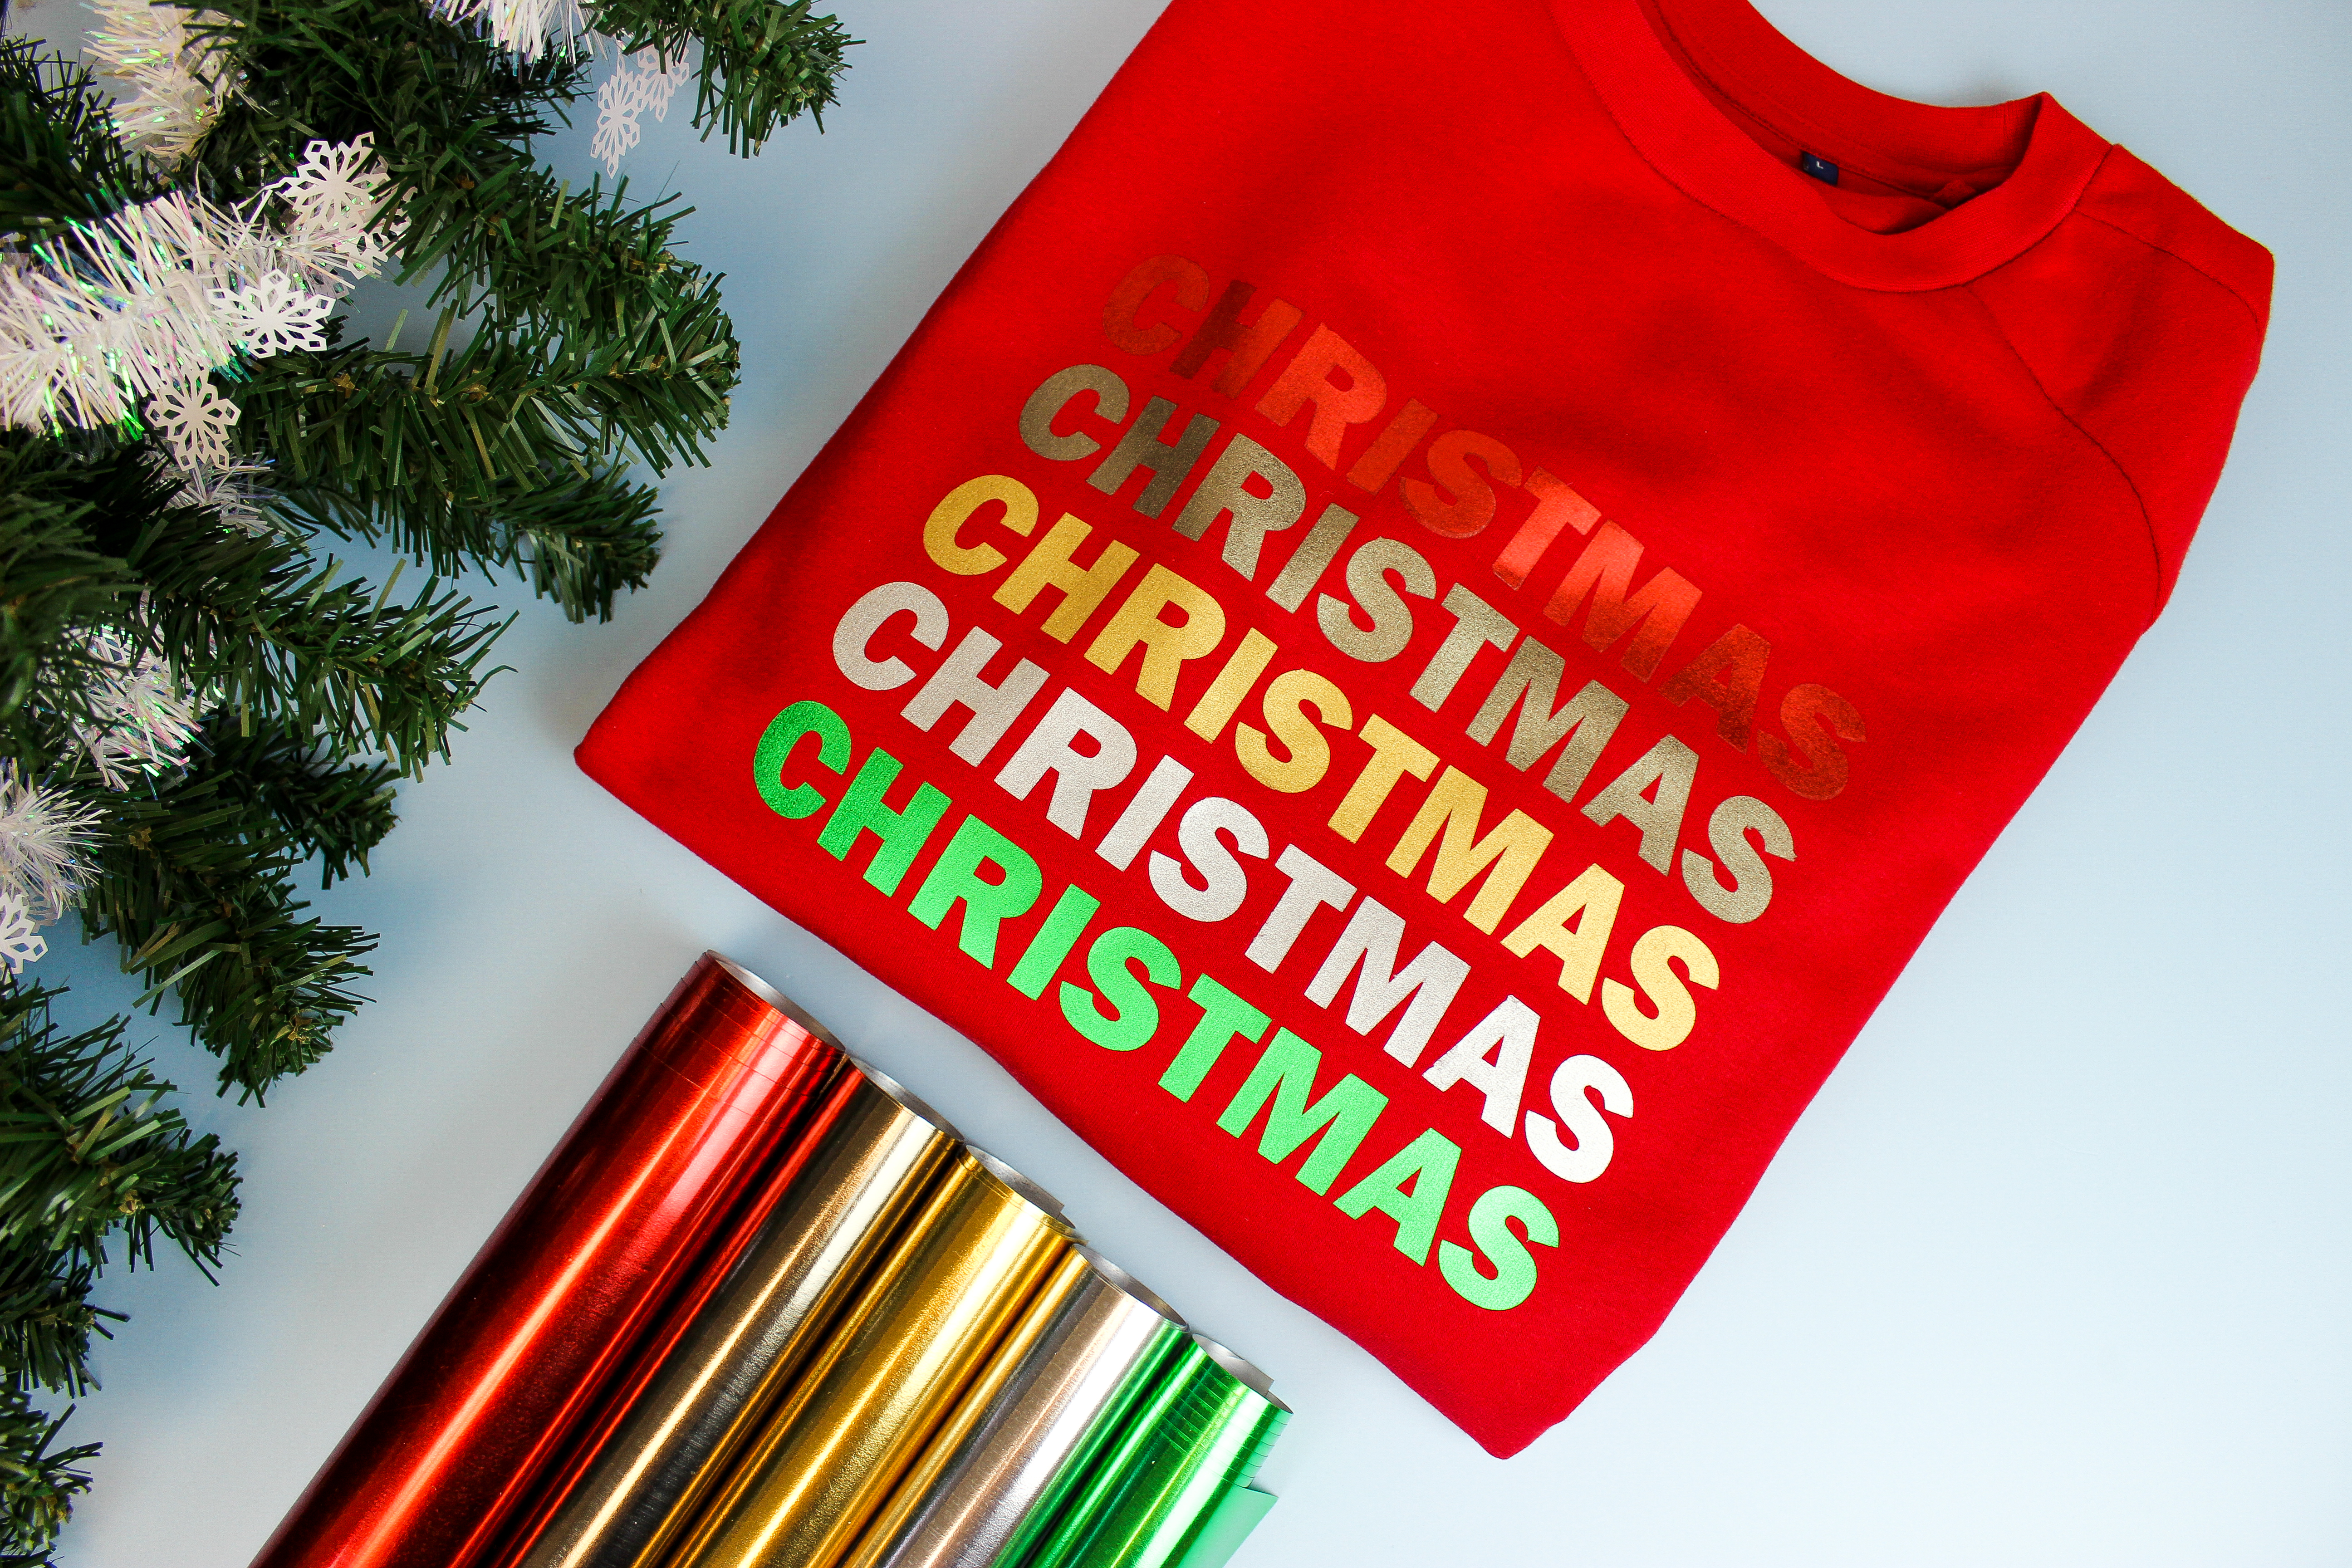 Stahls' Christmas Stretch Metallic HTV